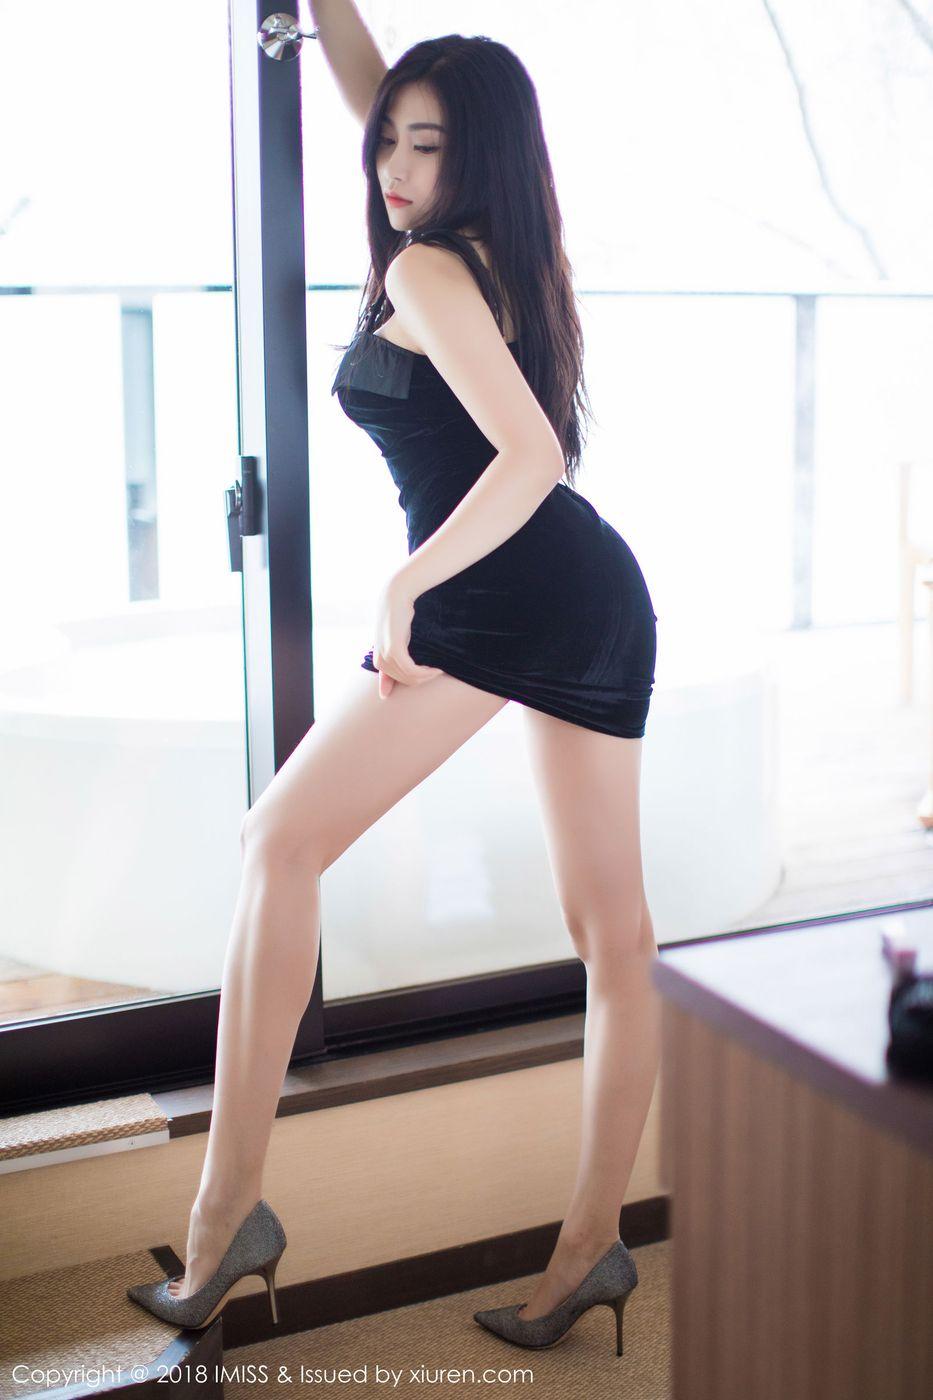 [IMiss爱蜜社] 性感女神许诺Sabrina皮衣吊裙北海道旅拍第一套 Vol.213